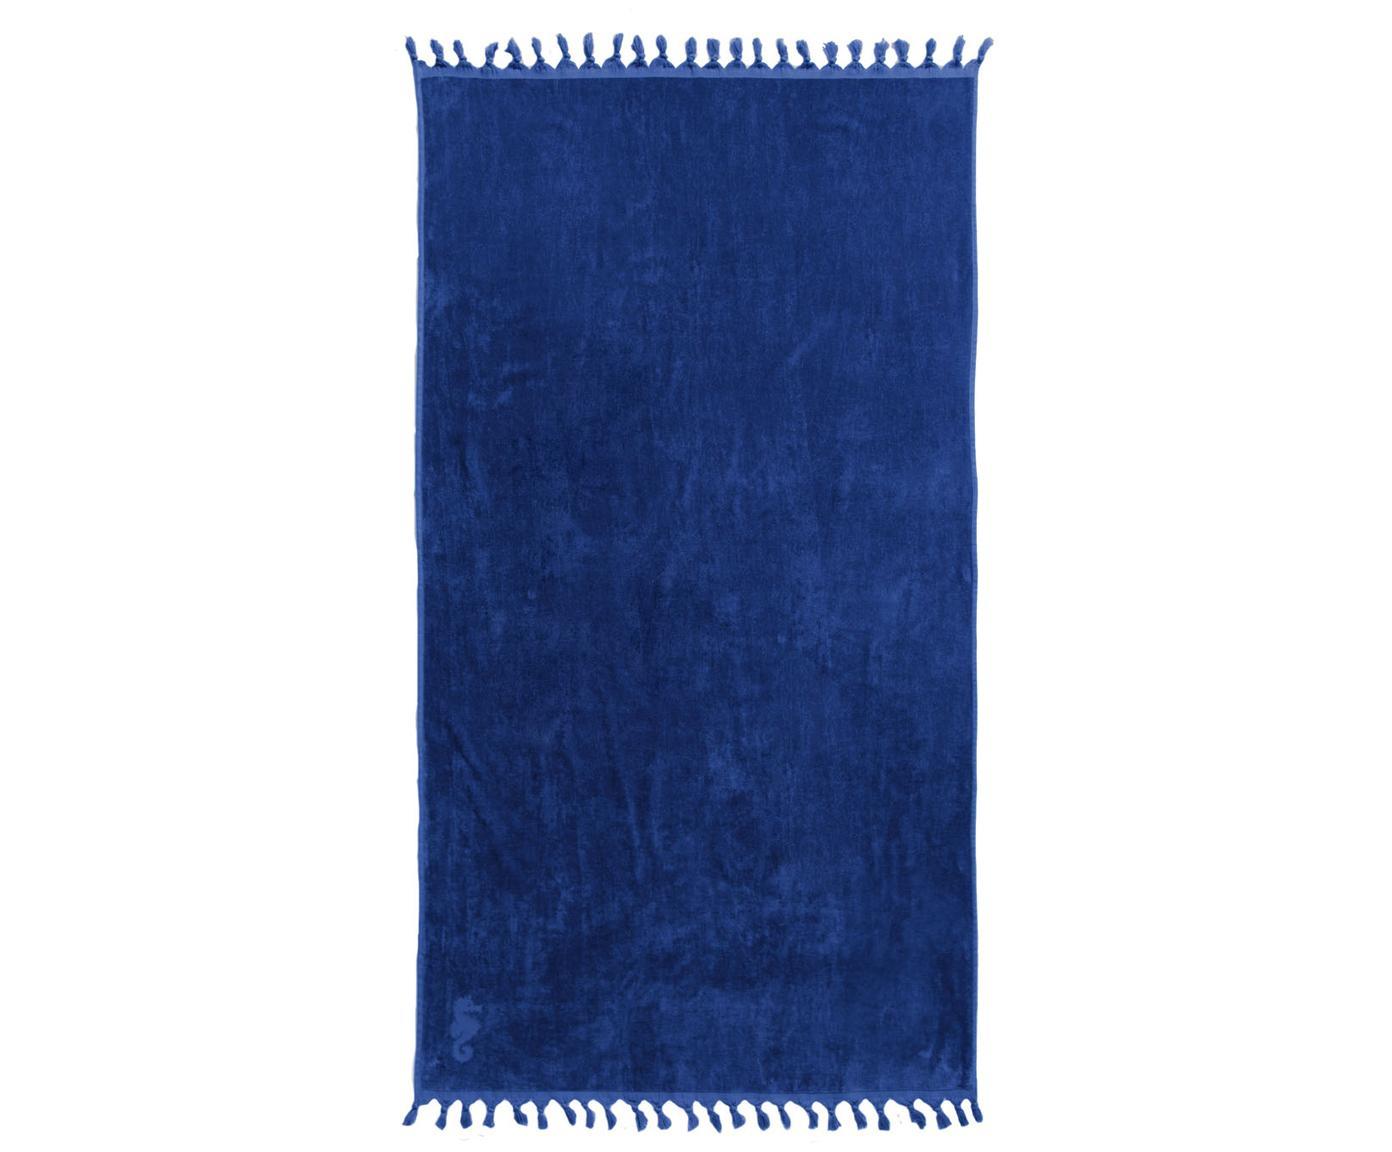 Hamamdoek Lushie, Katoen, middelzware stofkwaliteit, 355g/m², Donkerblauw, 100 x 180 cm